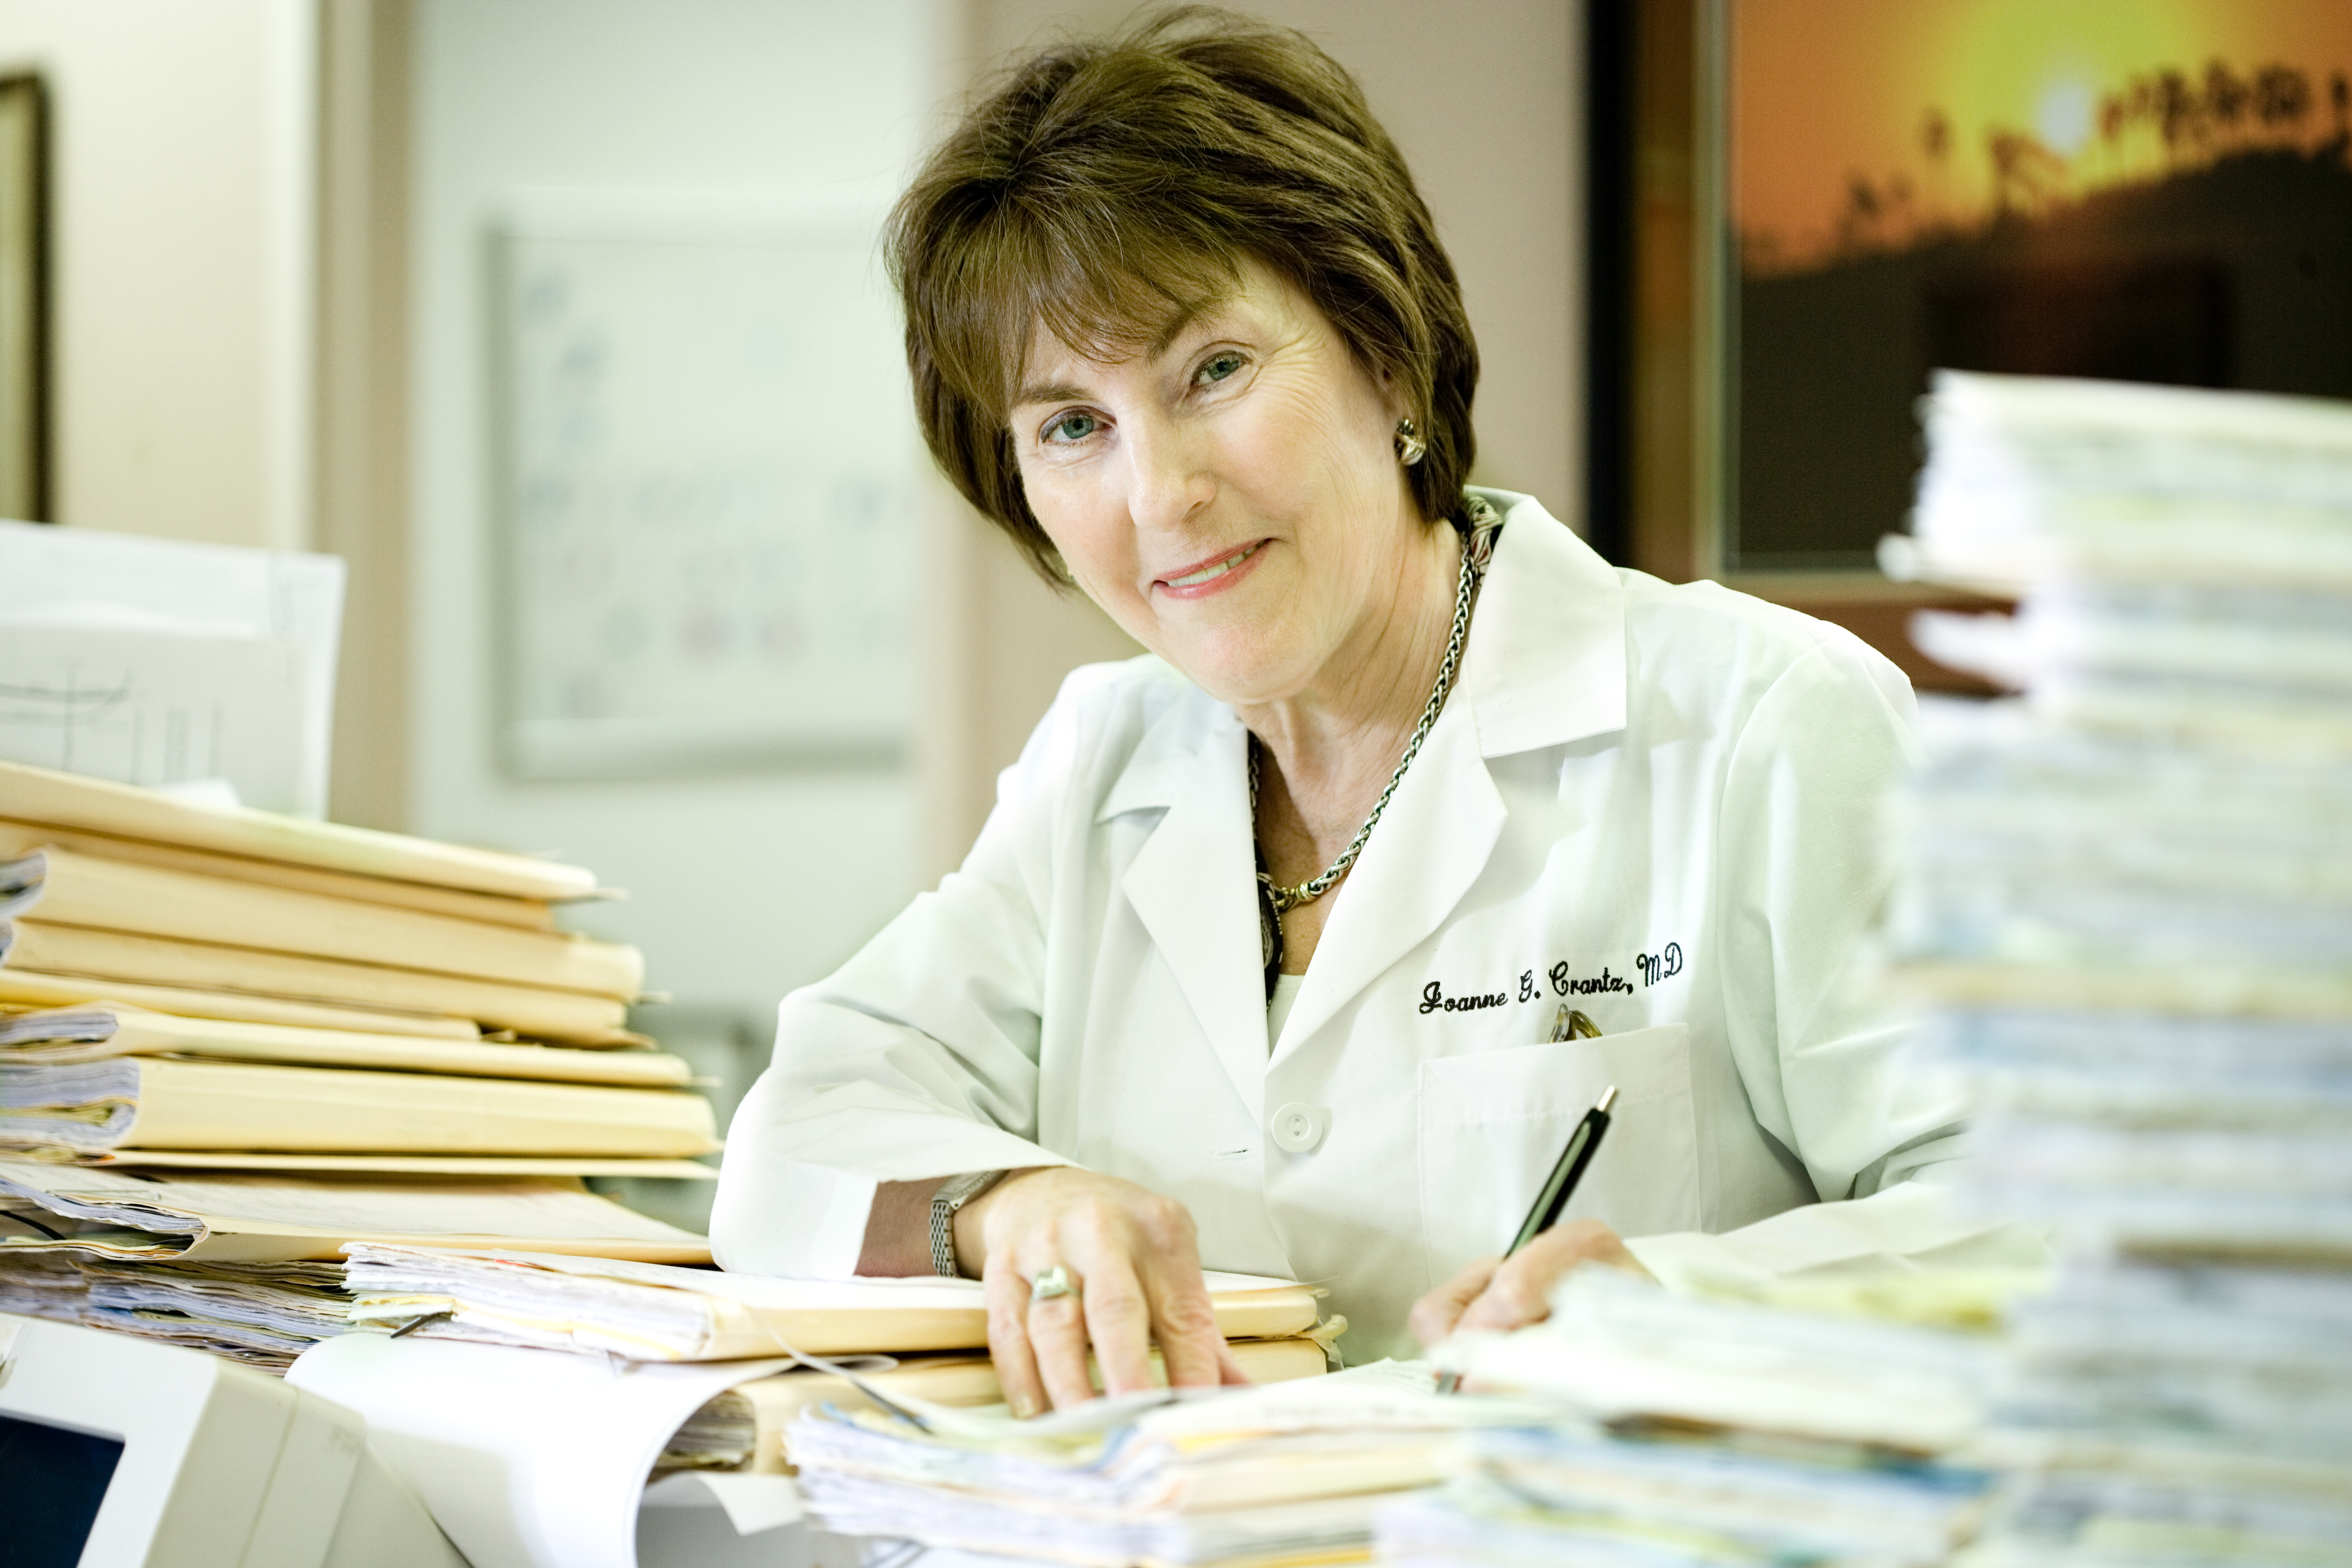 Dr. Joanne Crantz